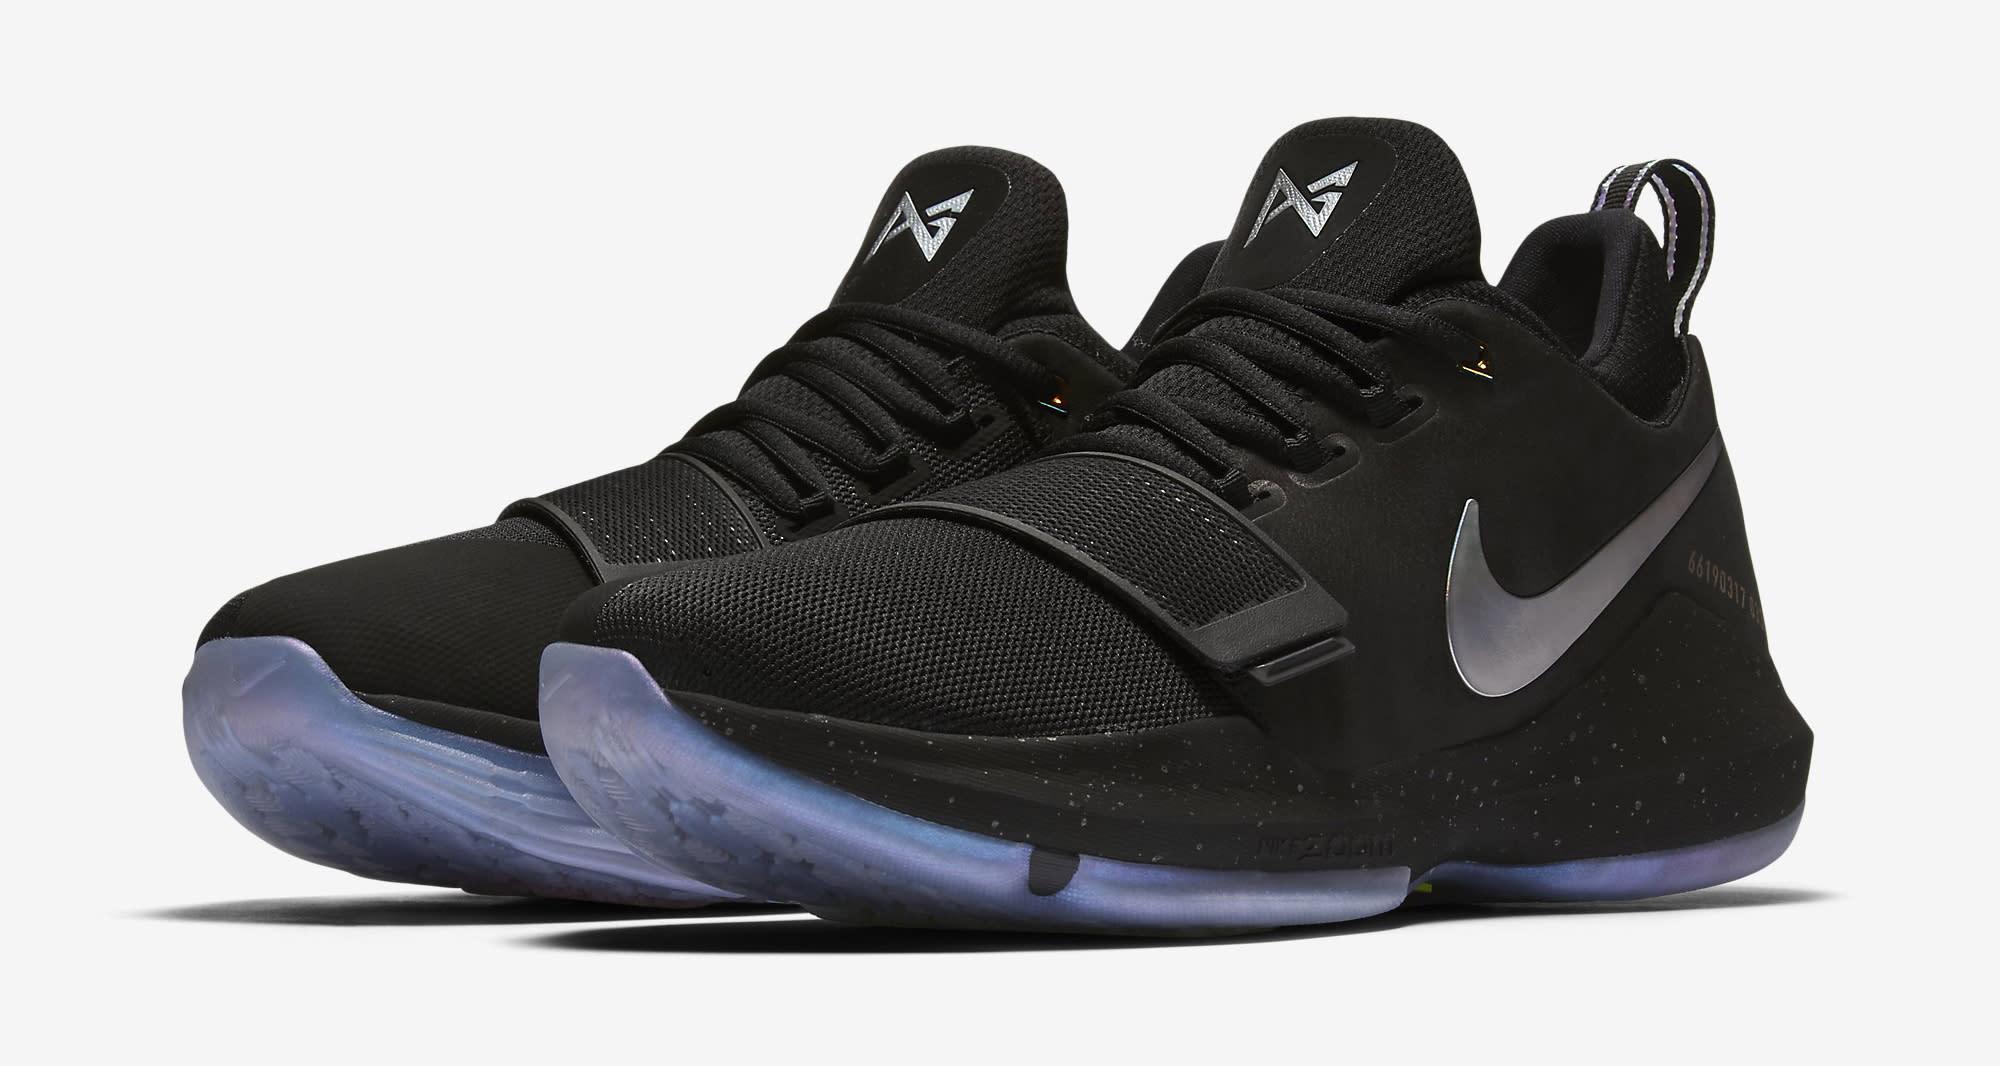 Nike Basketball Shoes  Images